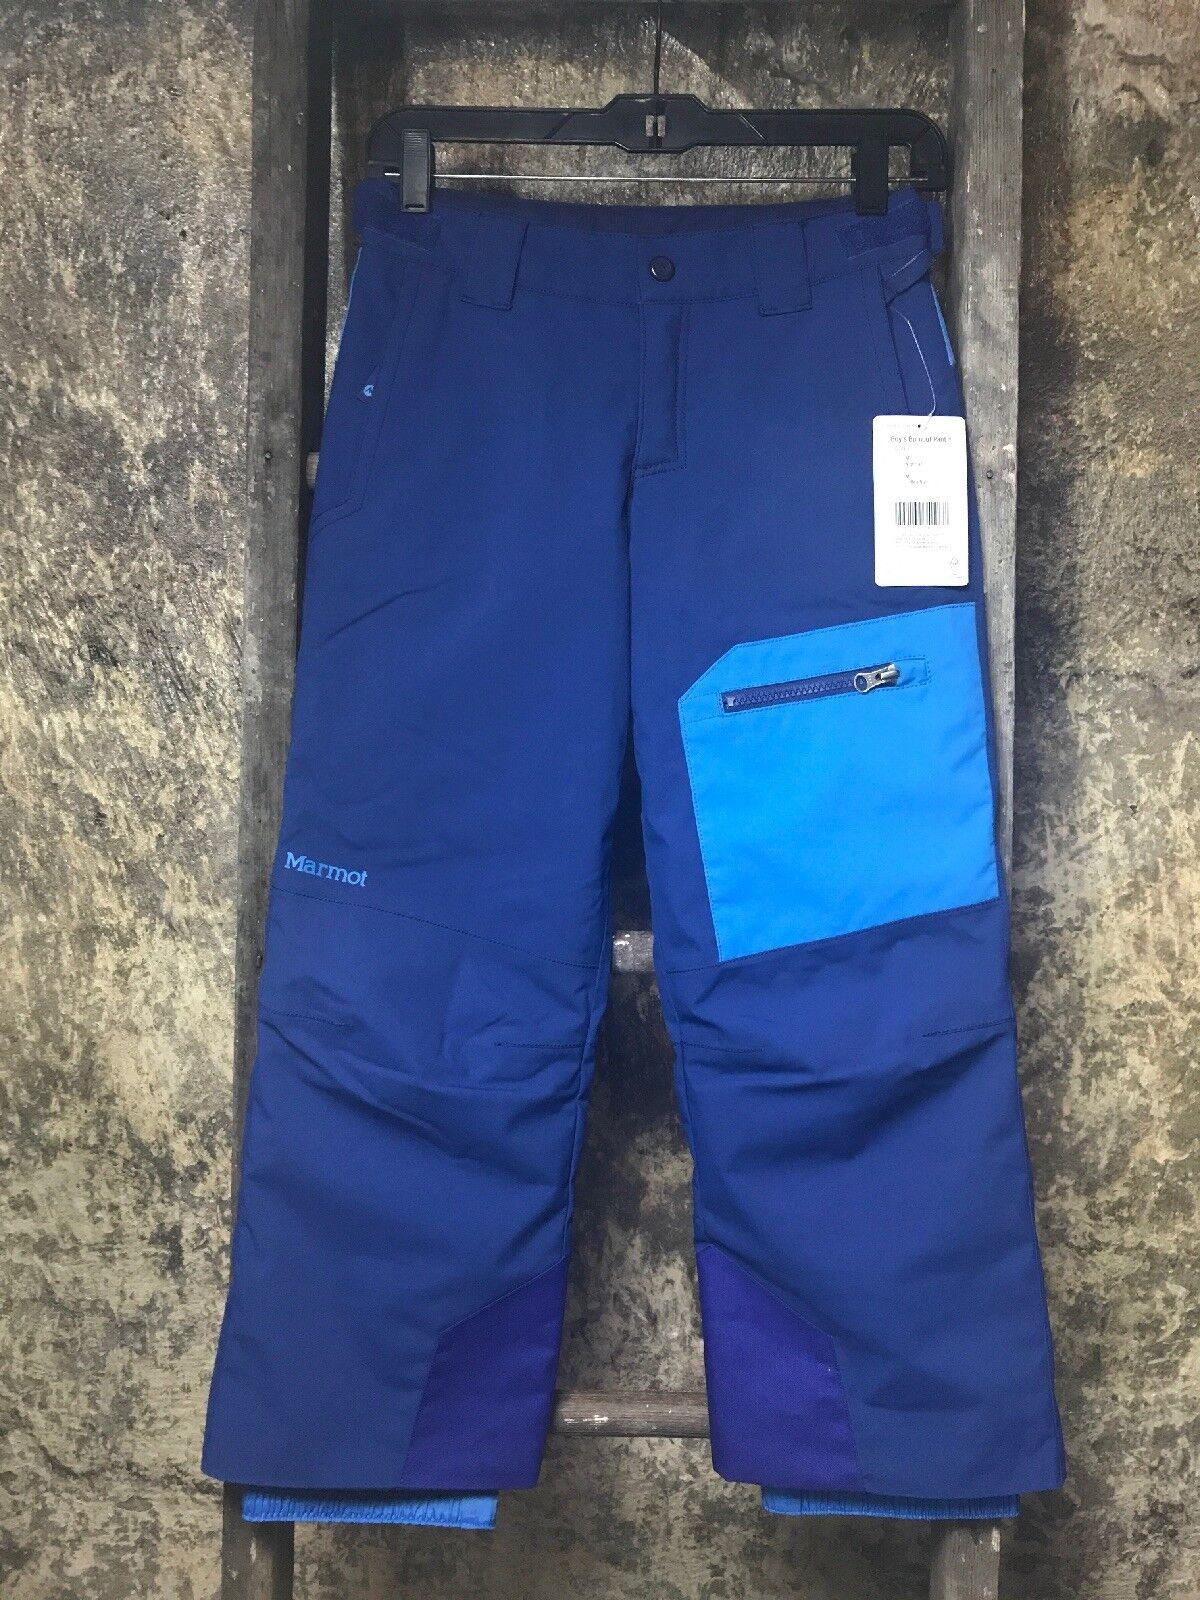 Marmot Burnout Boy's Snow Pants 74540 bluee Size Medium New with Tags